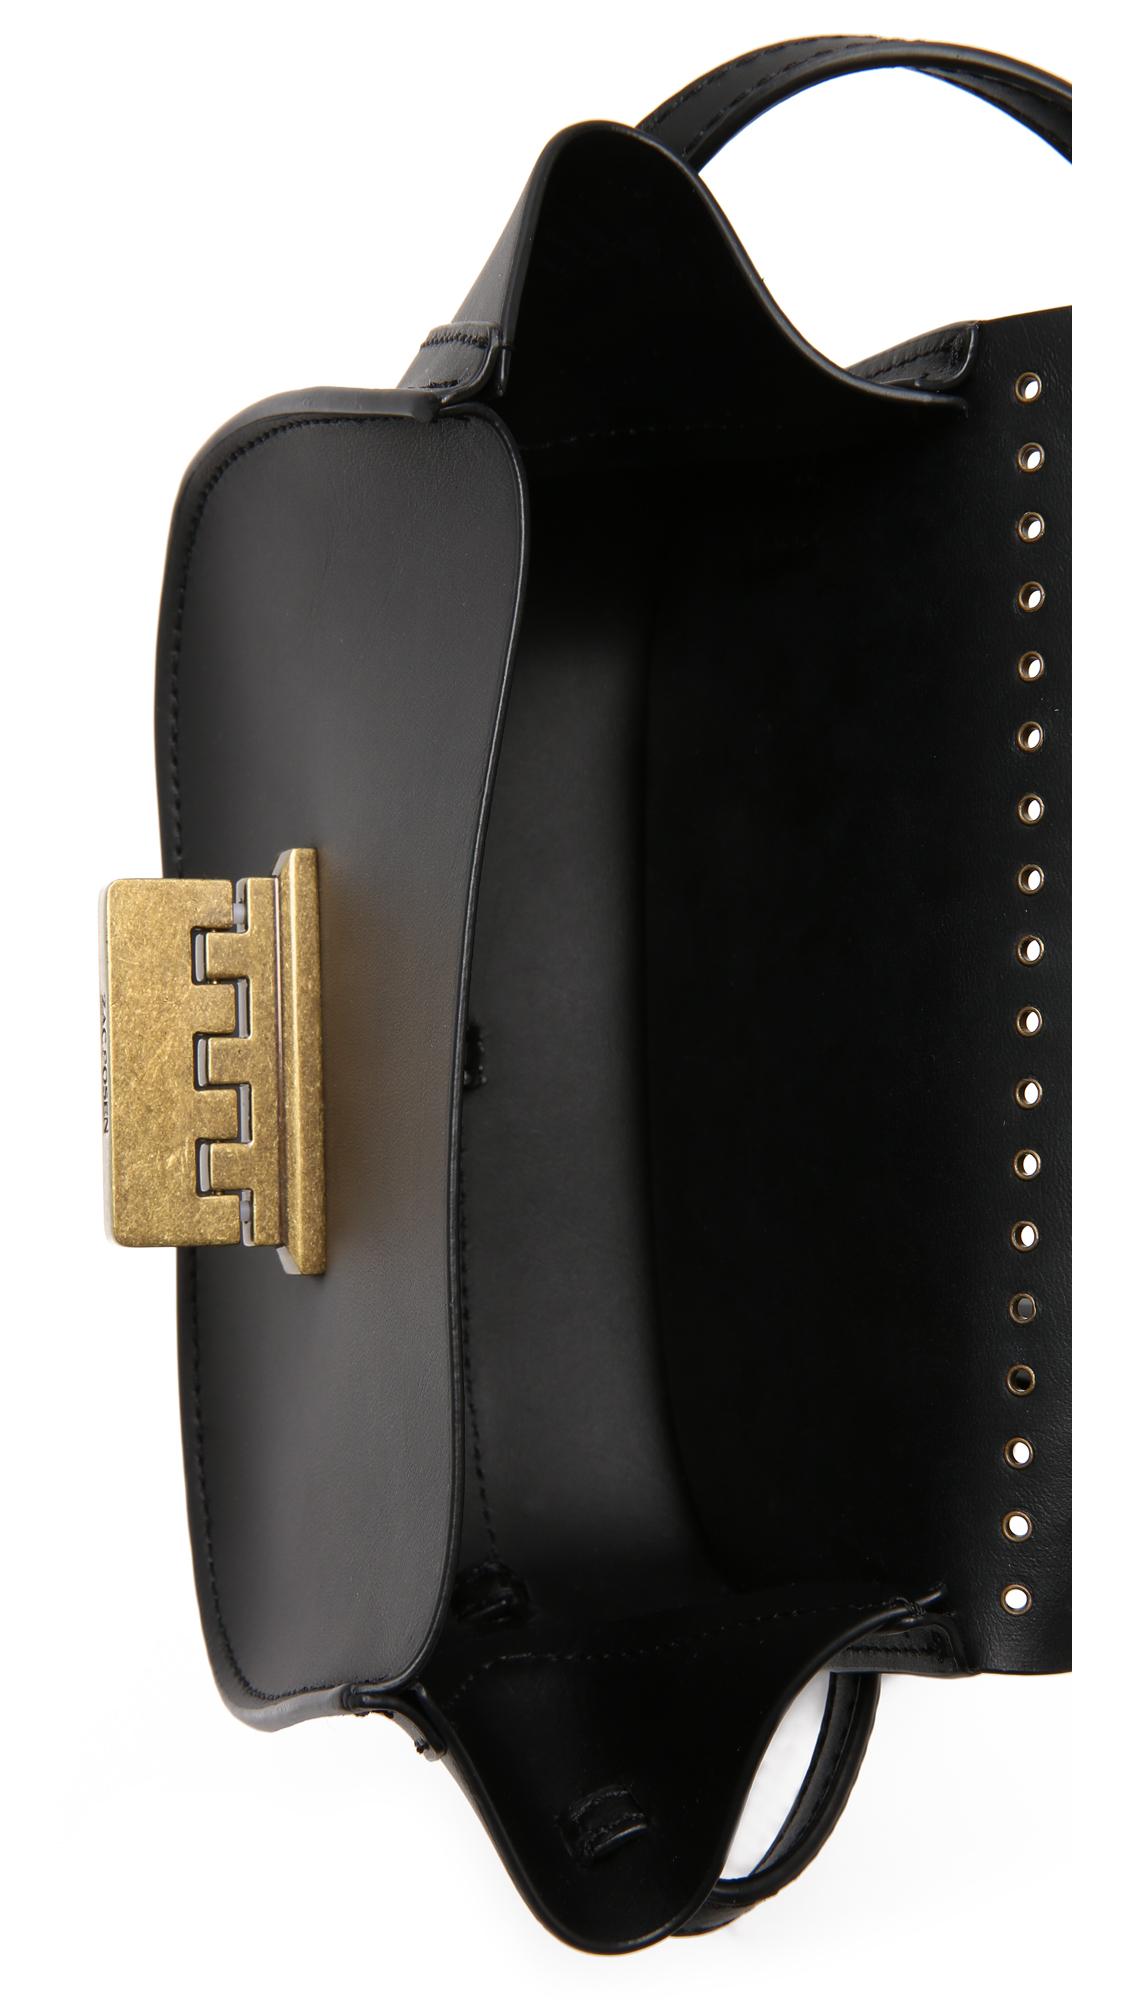 Zac Zac Posen Leather Eartha Micro Accordion Cross Body Bag With Grommets in Black